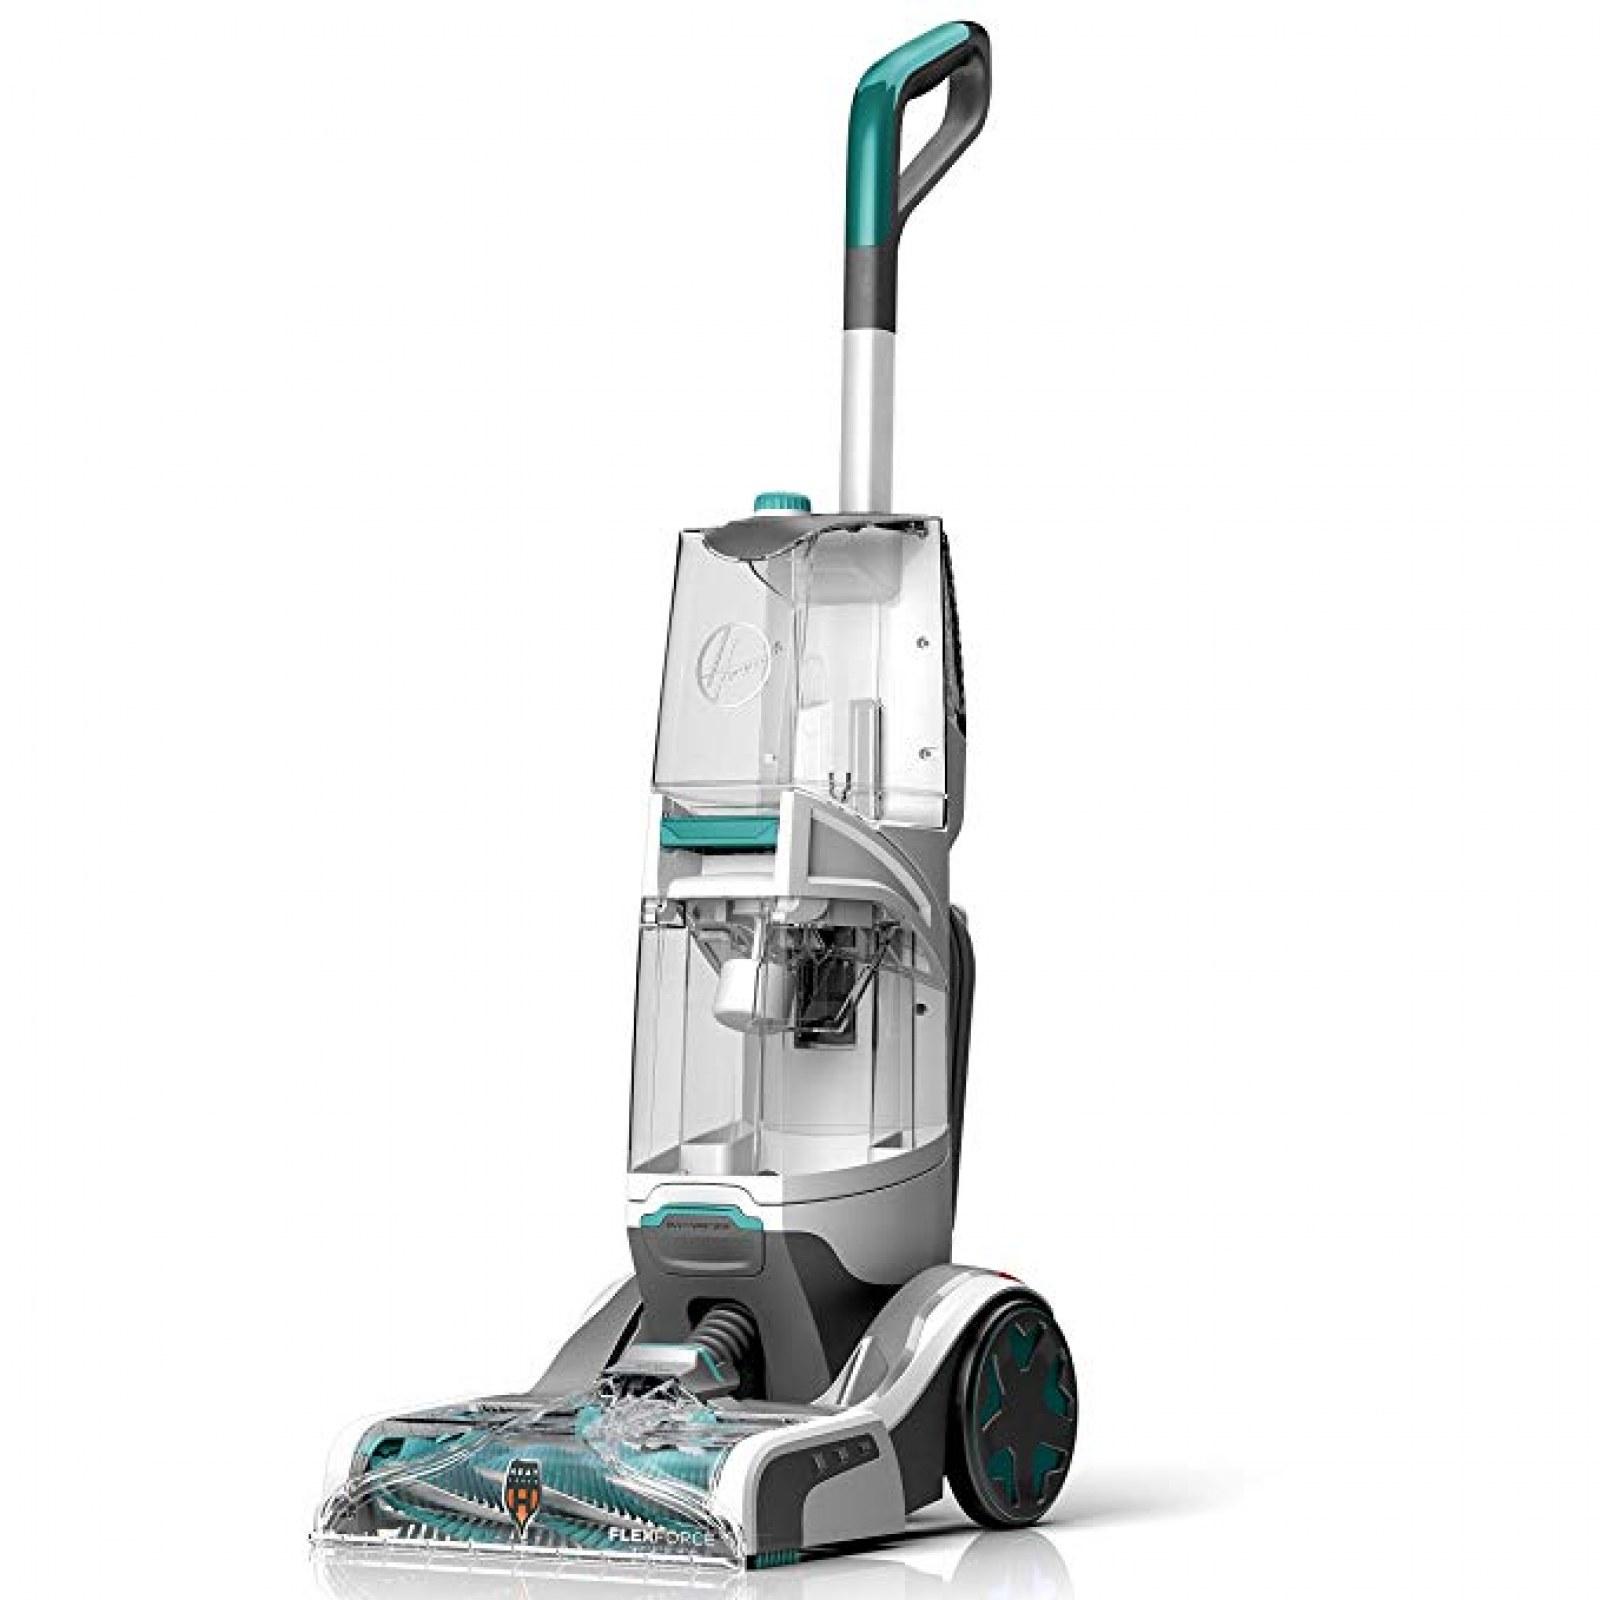 Best Prime Day 2019 Vacuum Deals Cordless Robot Handheld